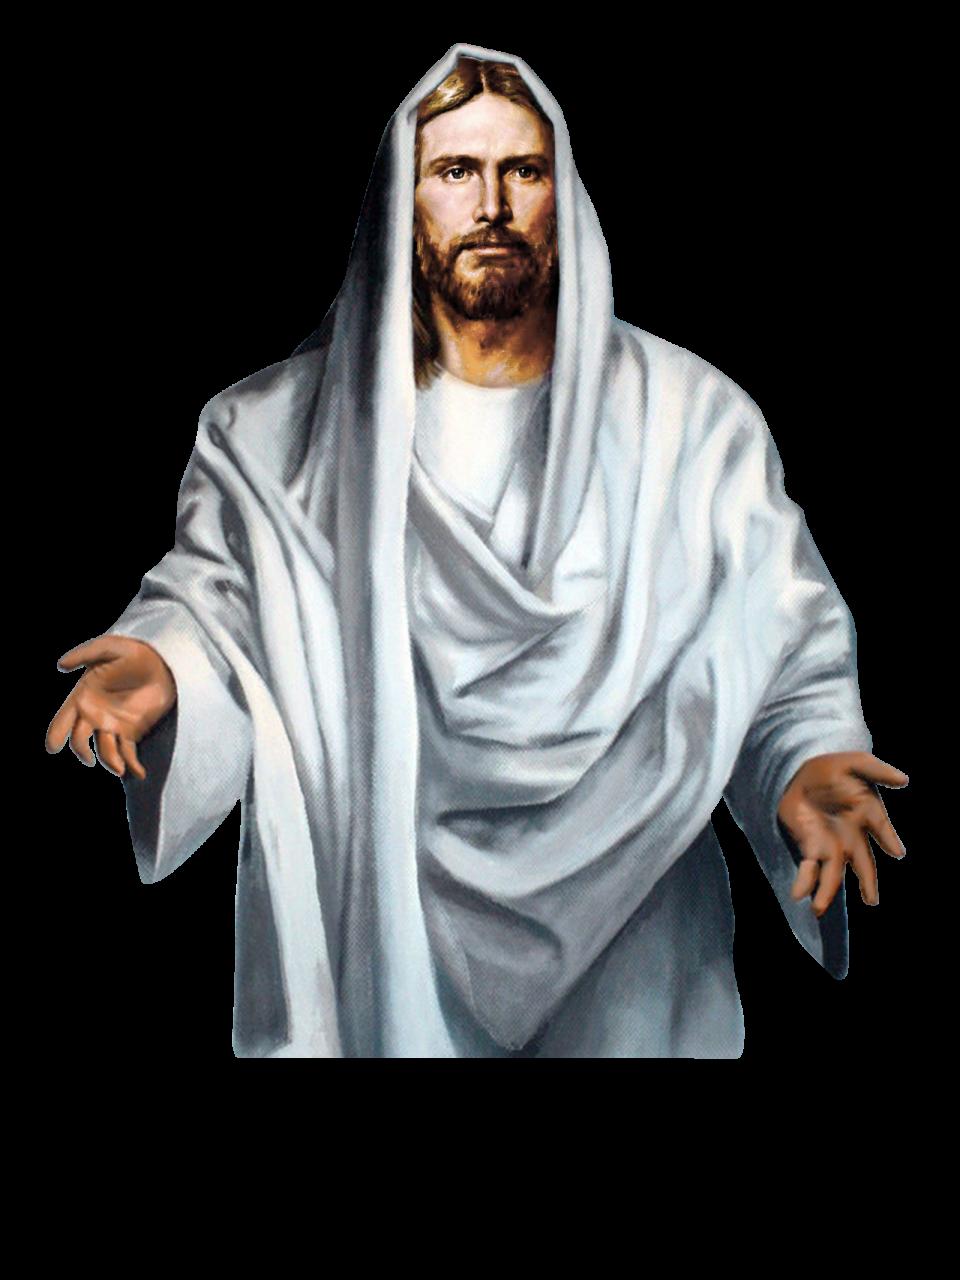 Jesus Christ PNG Image